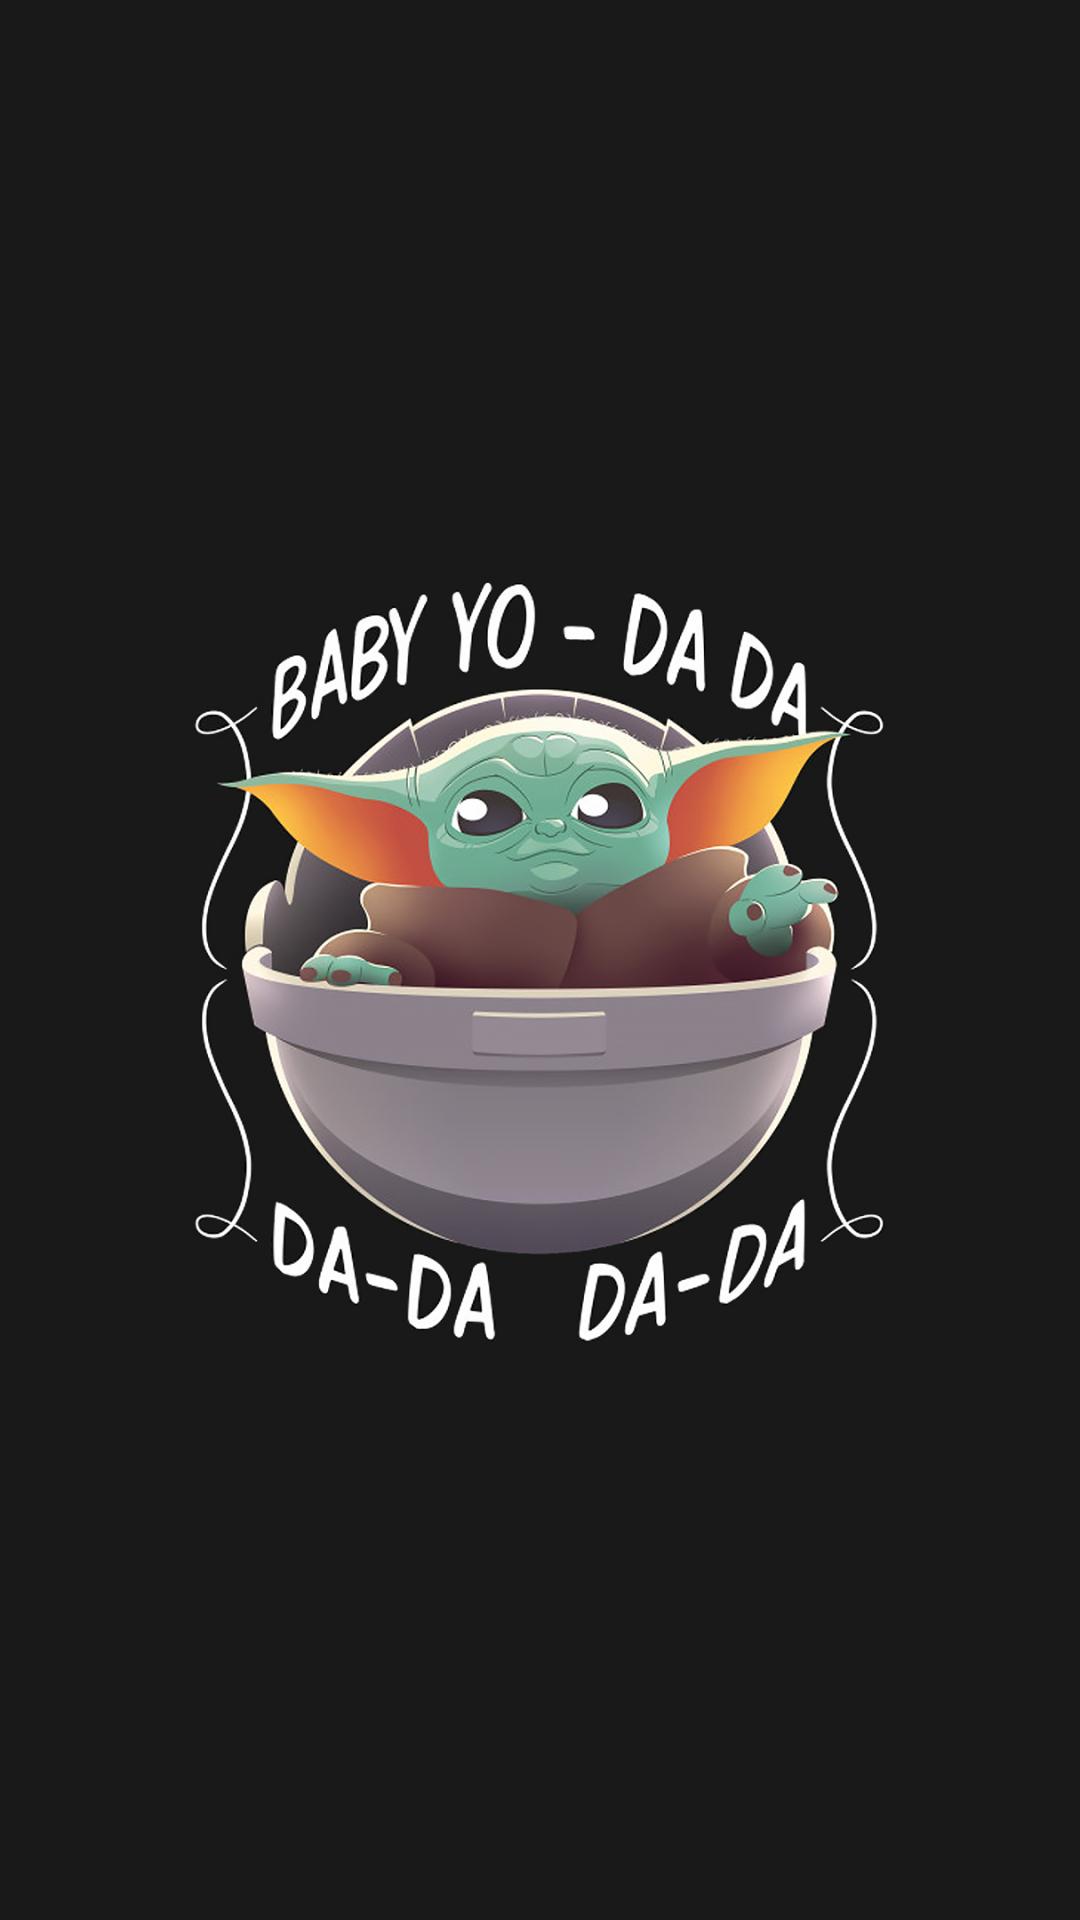 1080x1920 Cool Baby Yoda Minimalist Iphone 7, 6s, 6 Plus ...